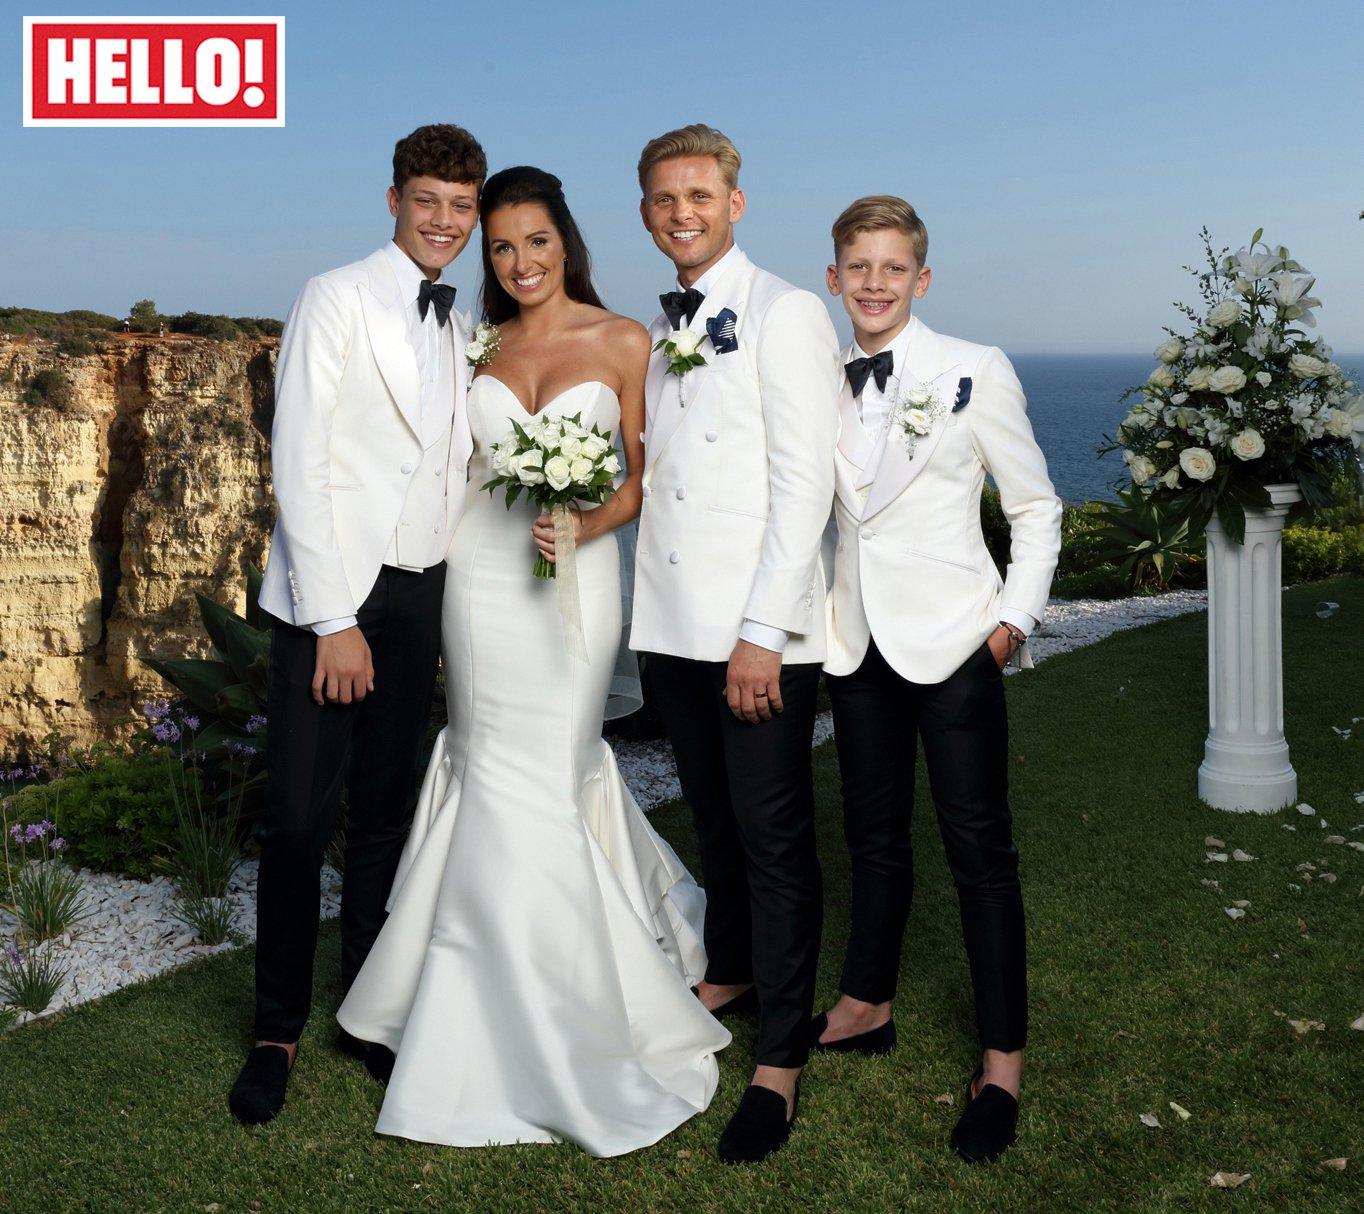 Jeff Brazier's new wife Kate still emotional over his sons' heartfelt wedding speech